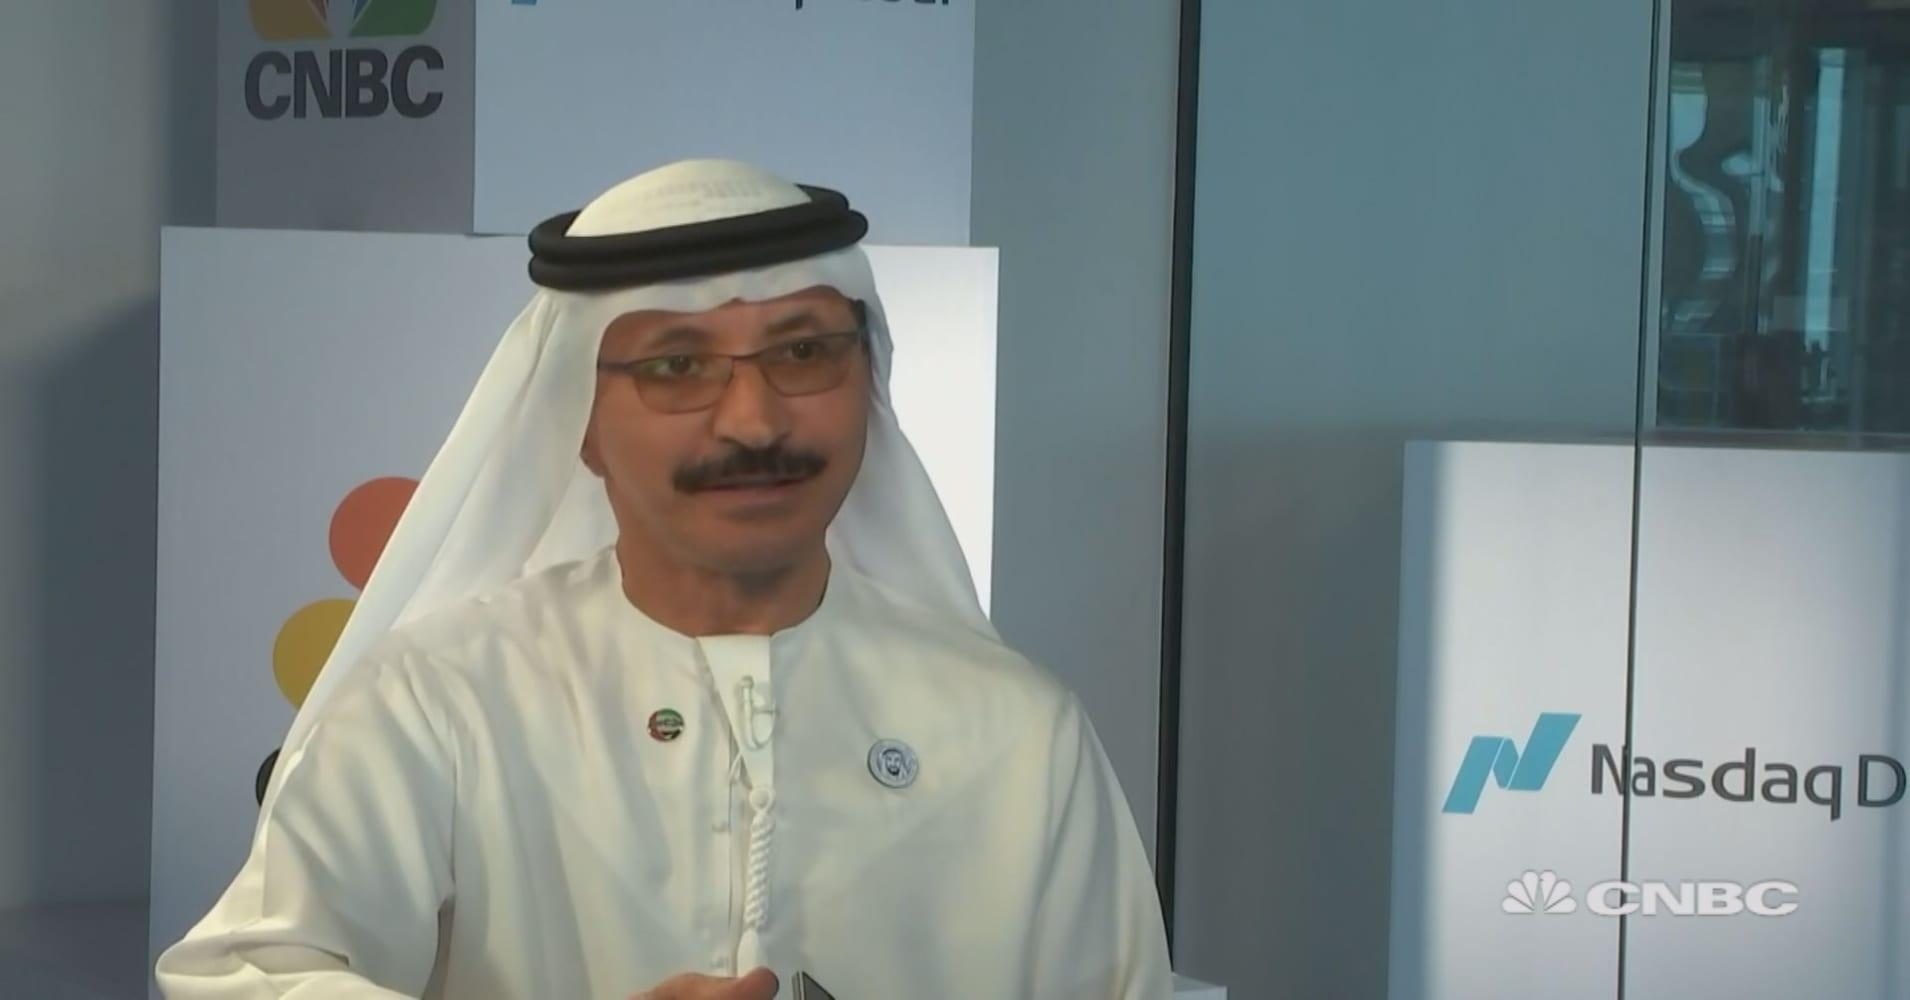 'Big interest' in Virgin Hyperloop One in Saudi Arabia, chairman says